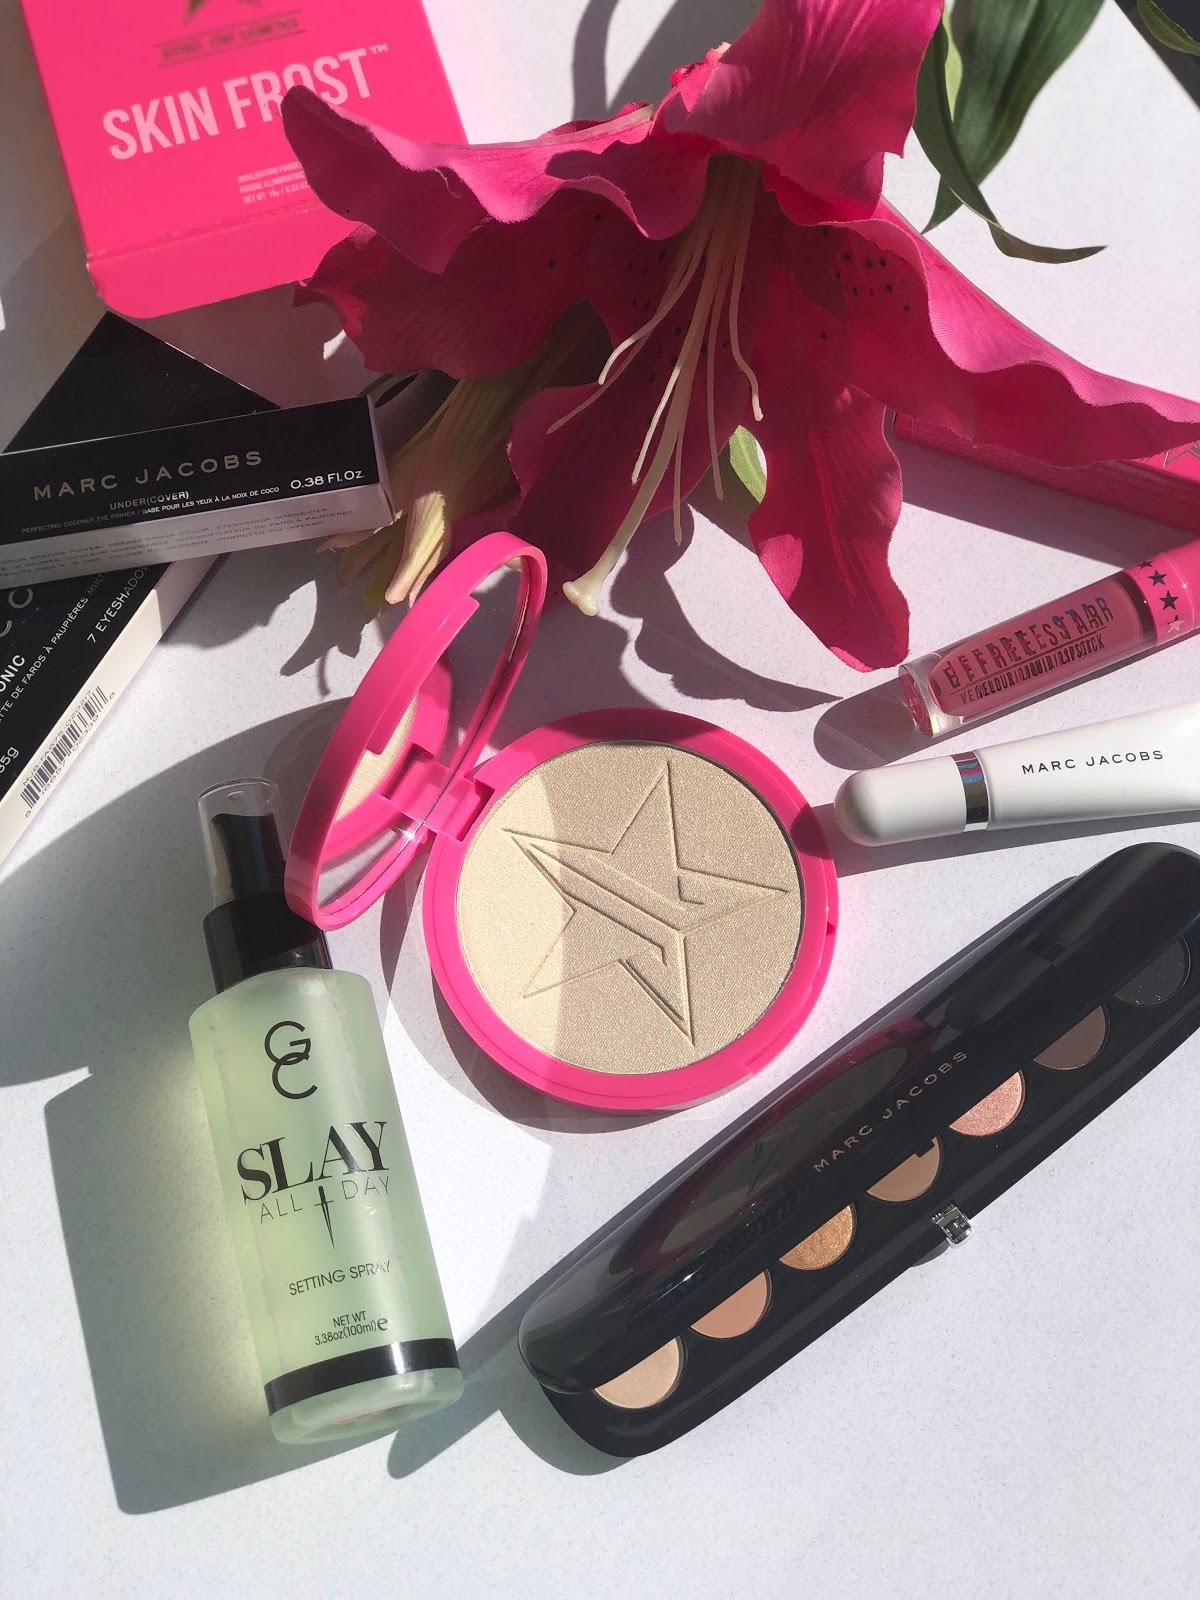 www.ourdubailife.com - My Top 5 Beauty Find January 2018